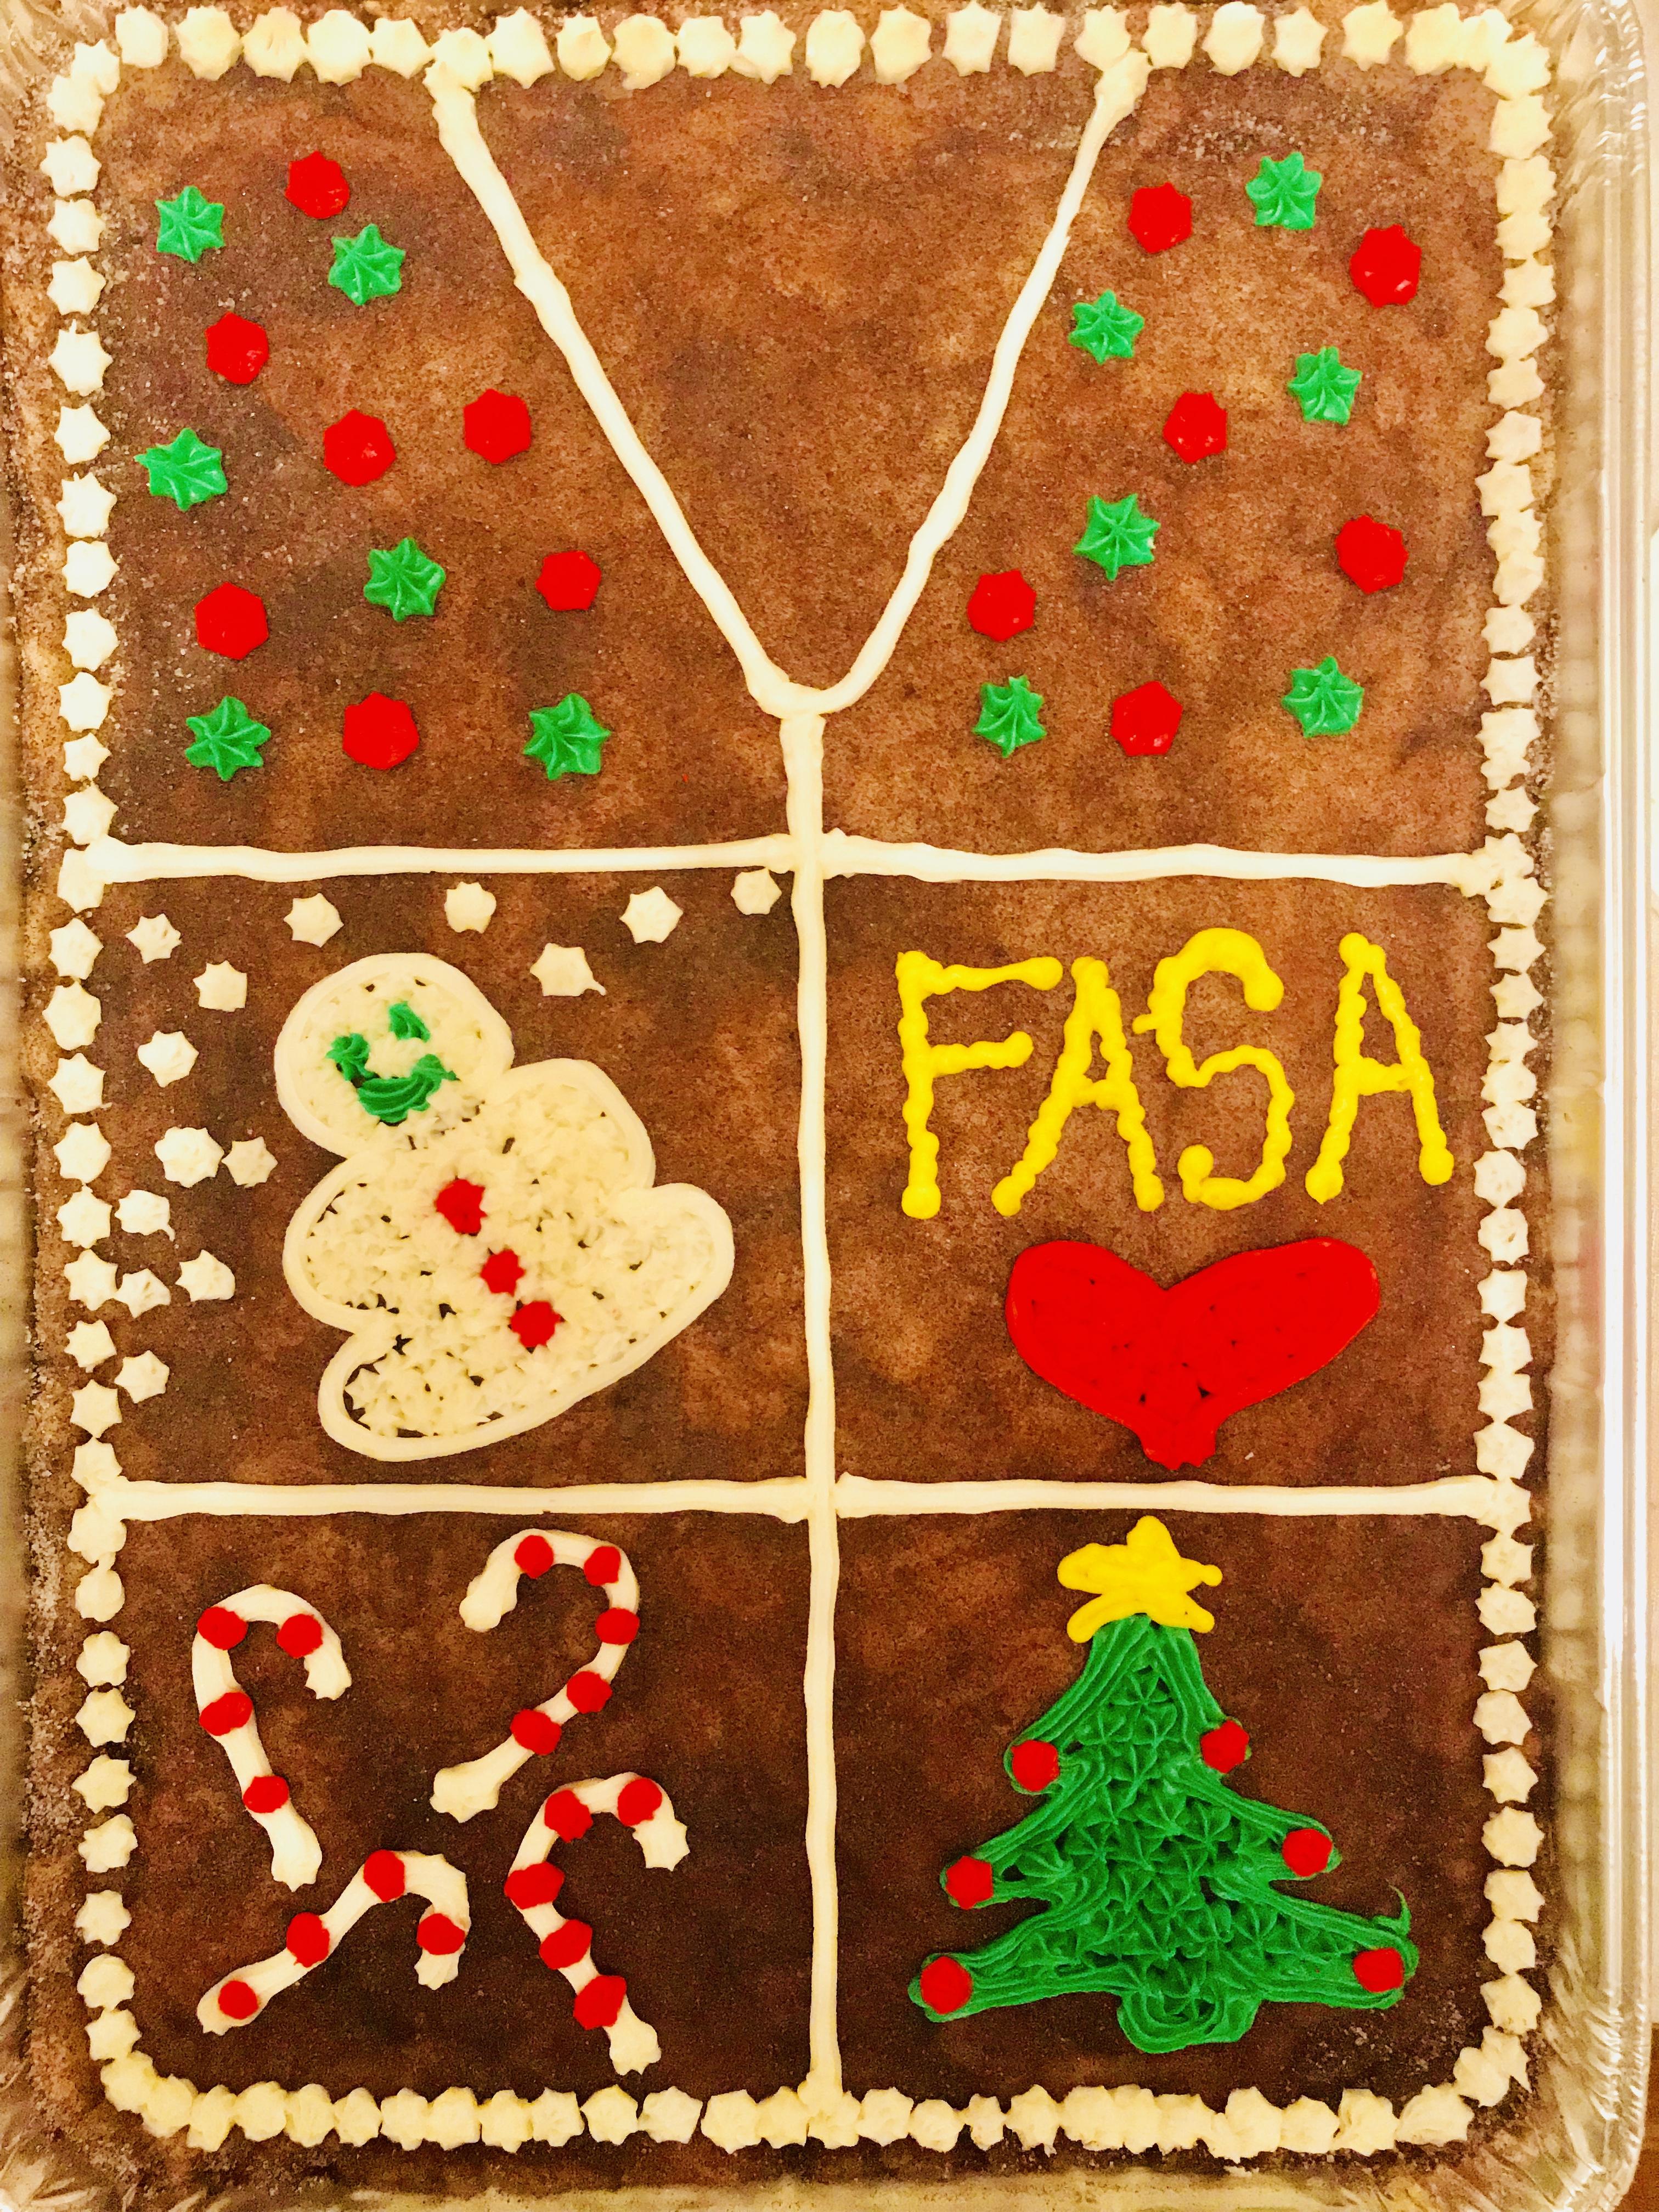 https://0201.nccdn.net/1_2/000/000/12a/83c/fasa_Christmas-3024x4032.jpg